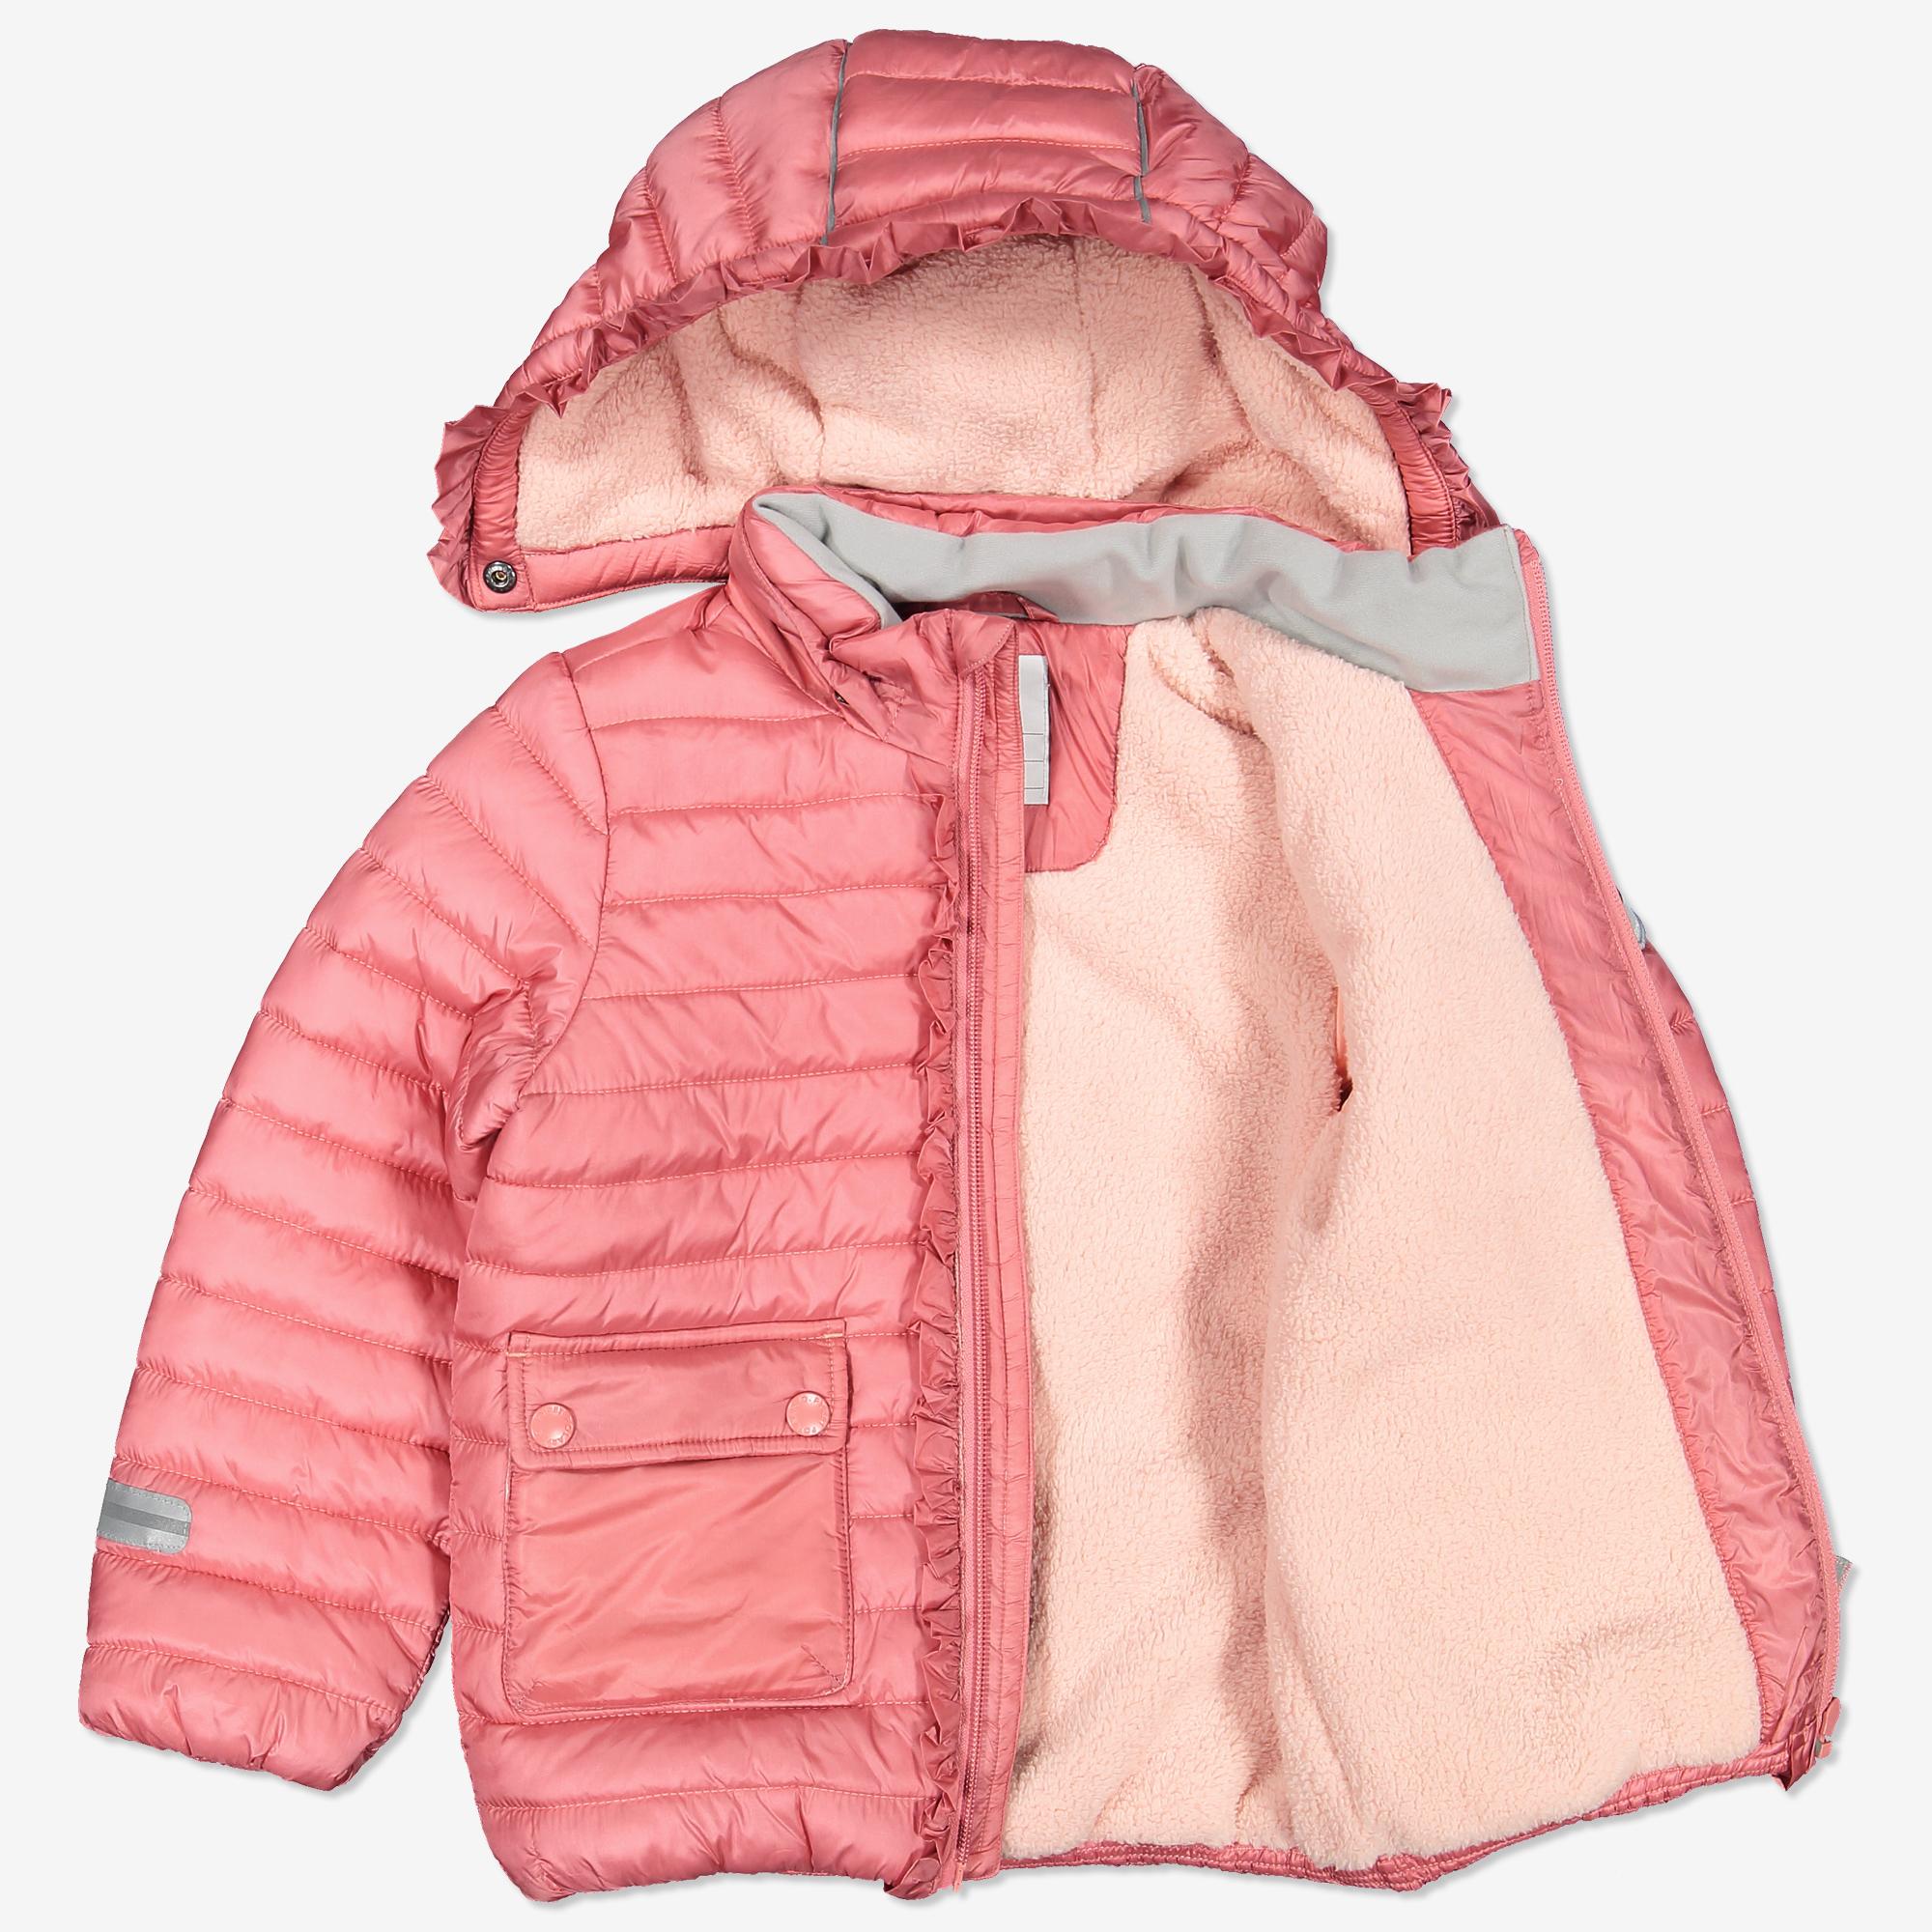 d61322128 Lett jakke med volang rosa | Polarnopyret.no